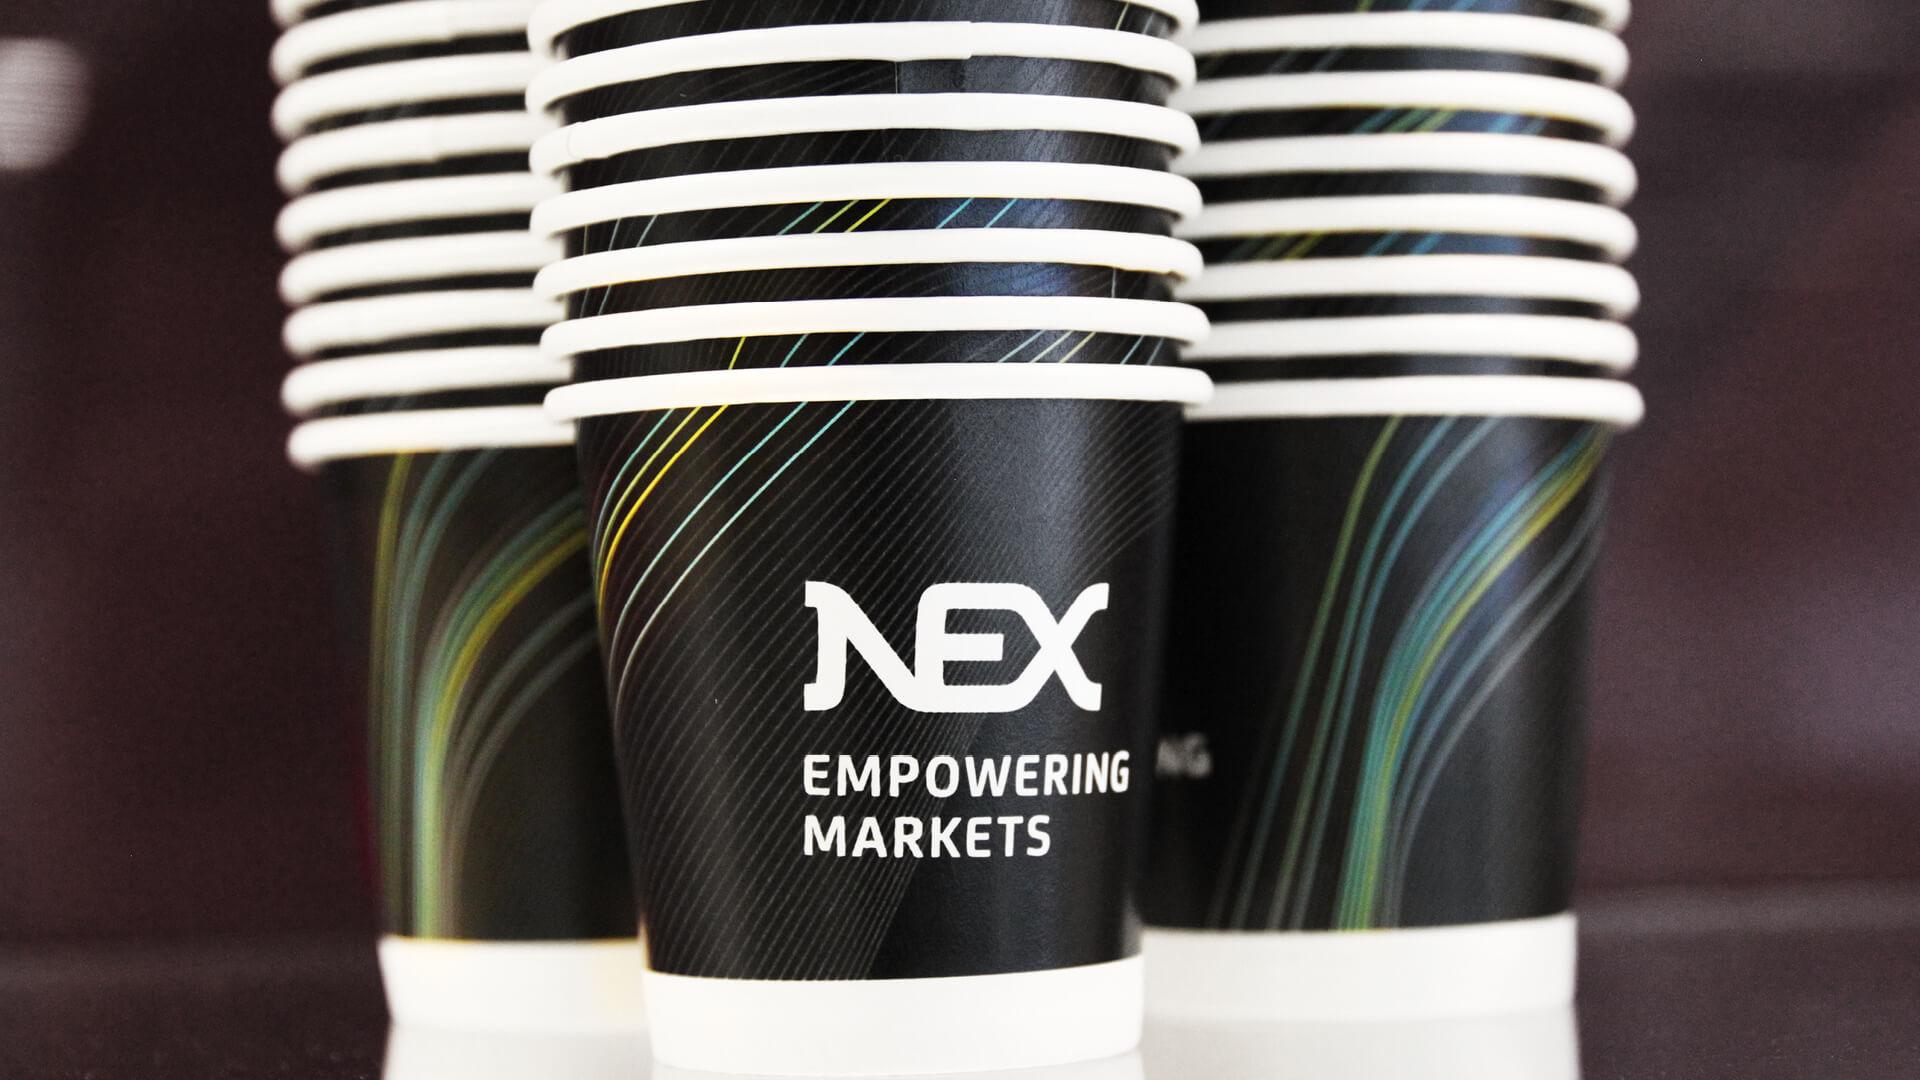 nex brand launch office branding